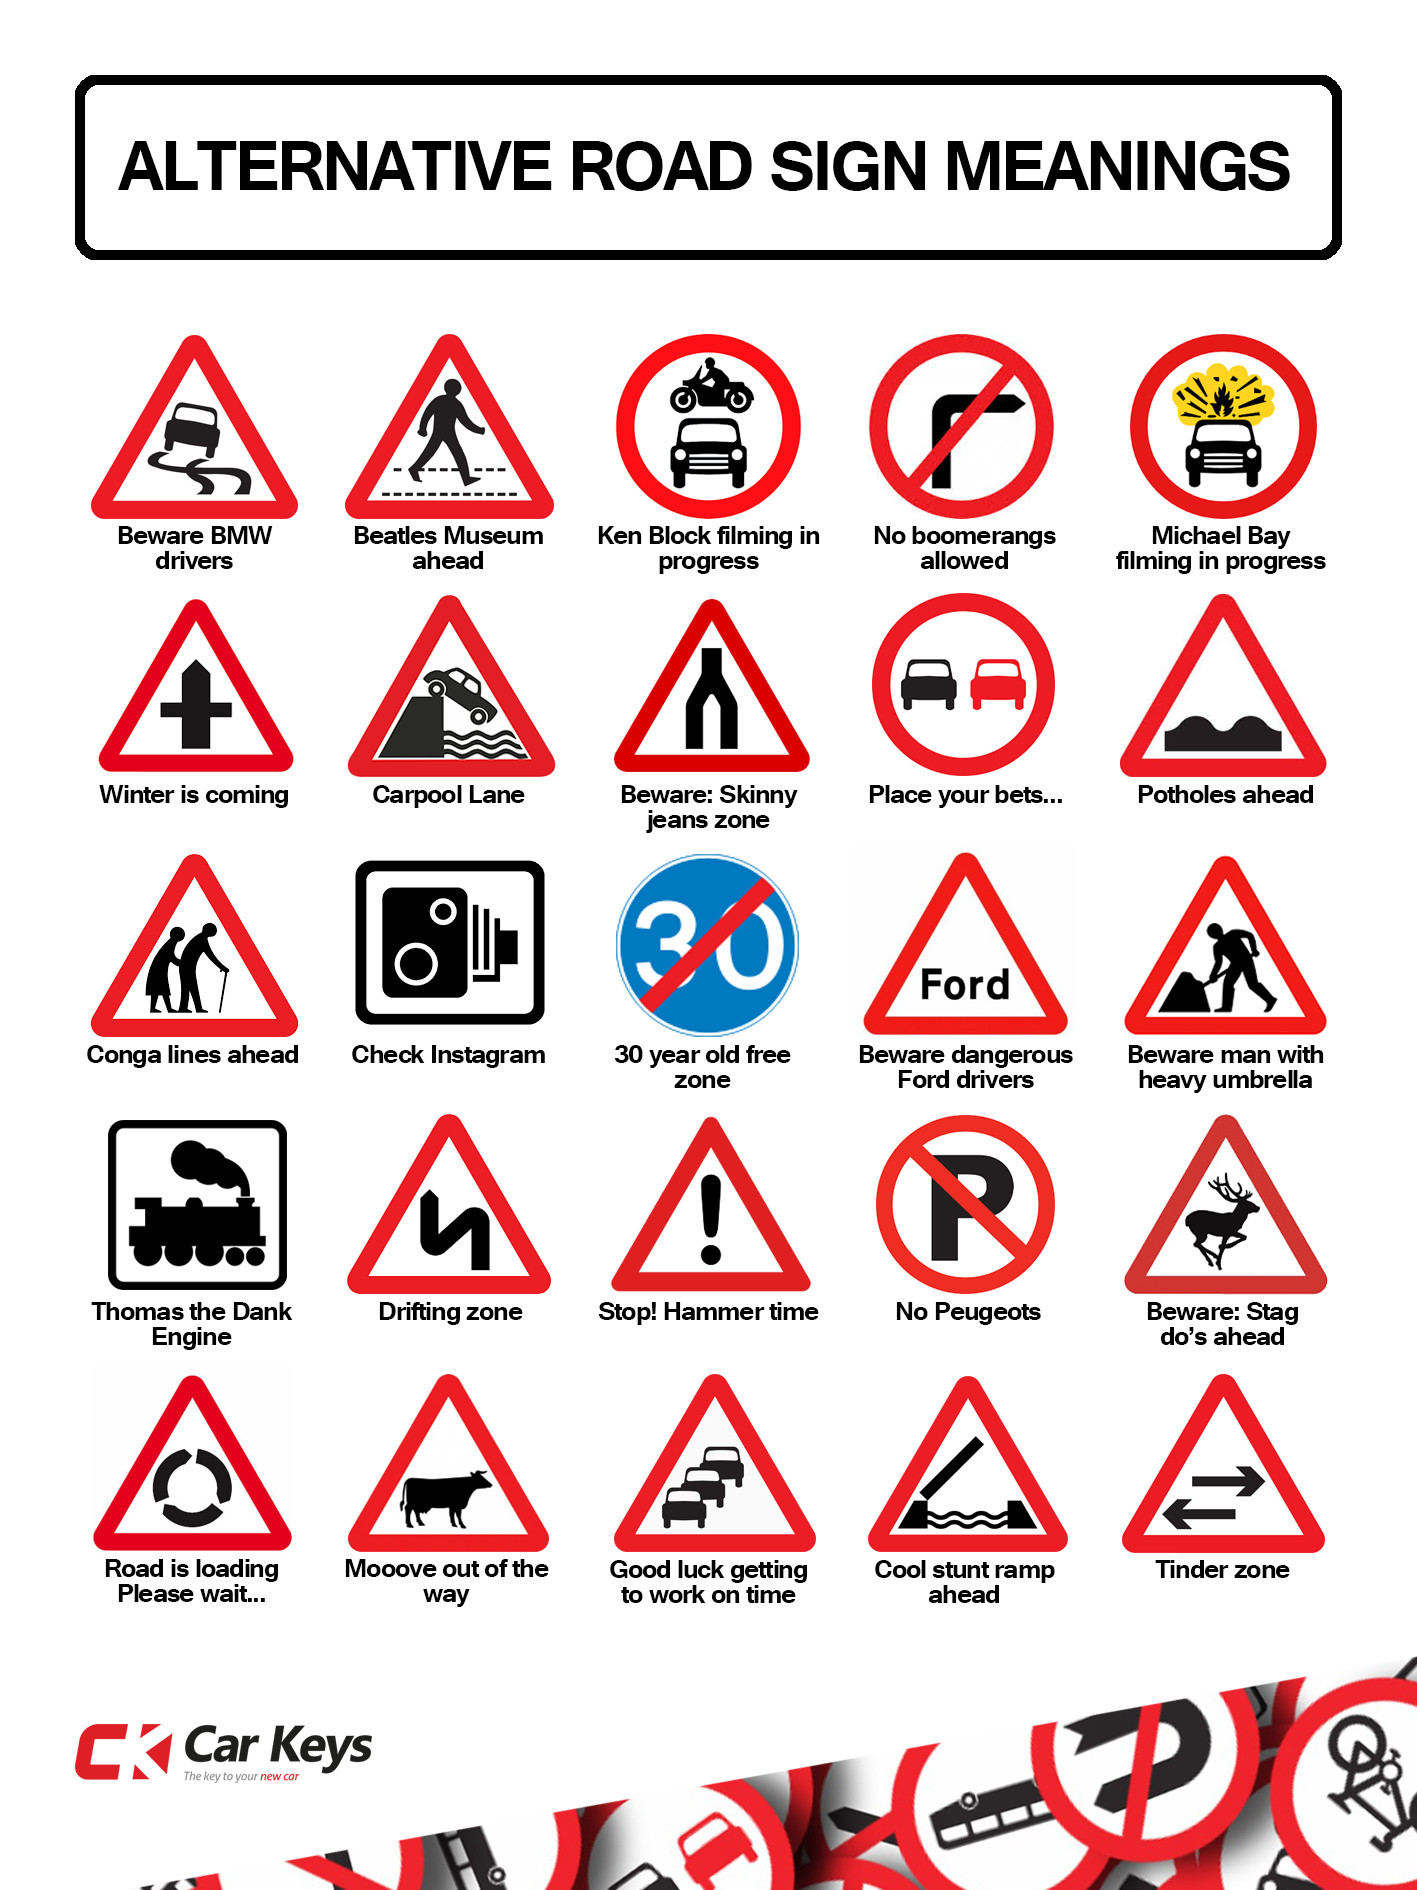 Funny Alternative Road Signs